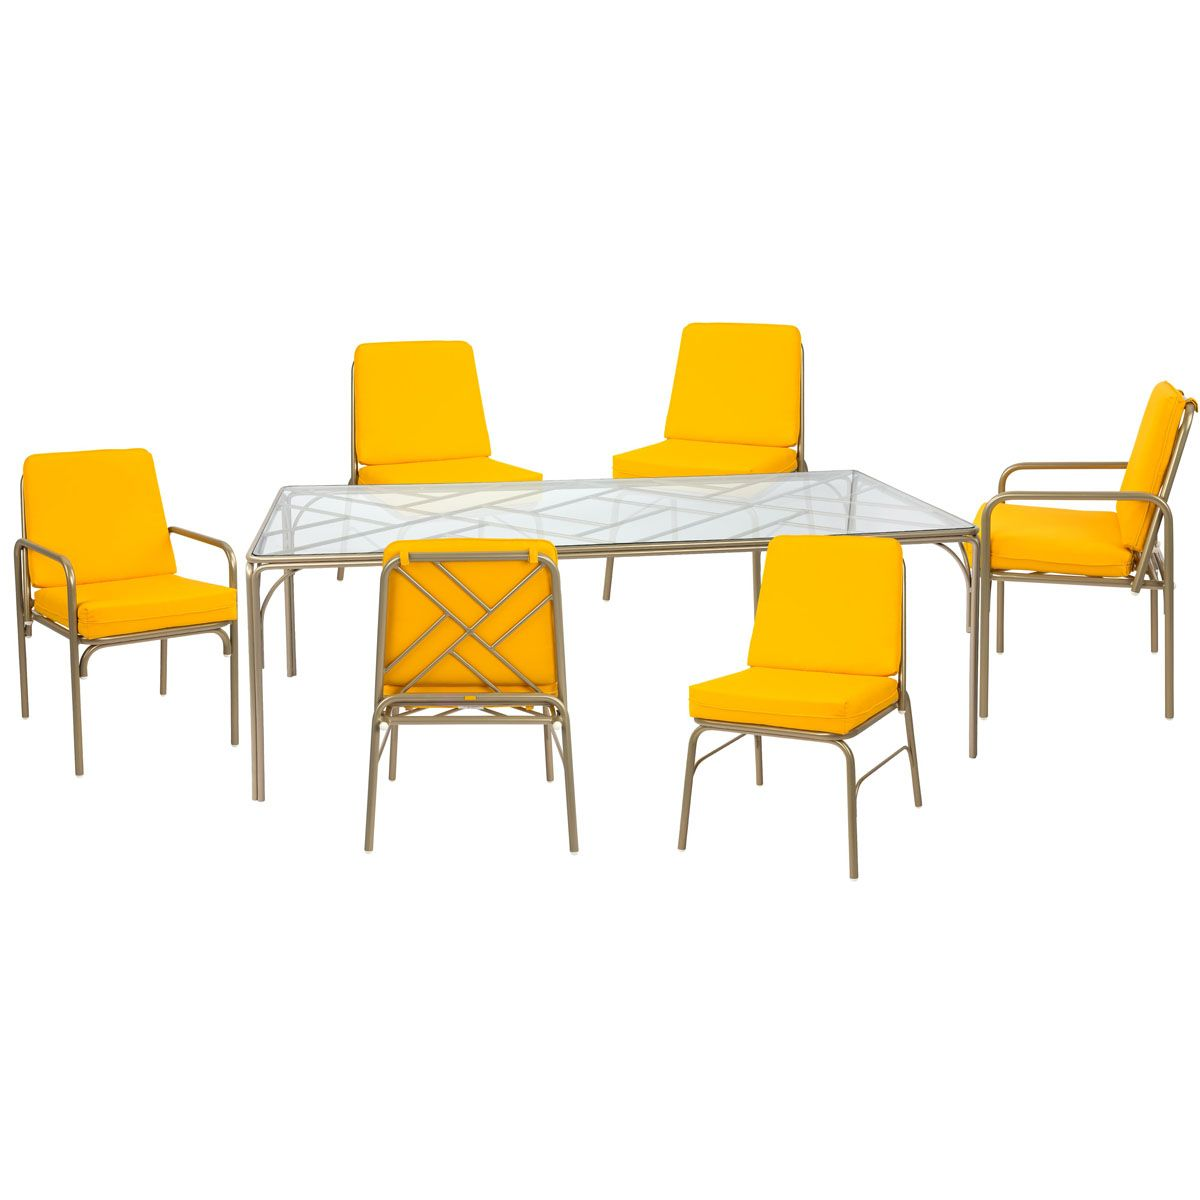 Fairy Tale 7 Piece Outdoor Dining Set Patio Furnishings Contemporary Patio Furniture Diy Patio Furniture